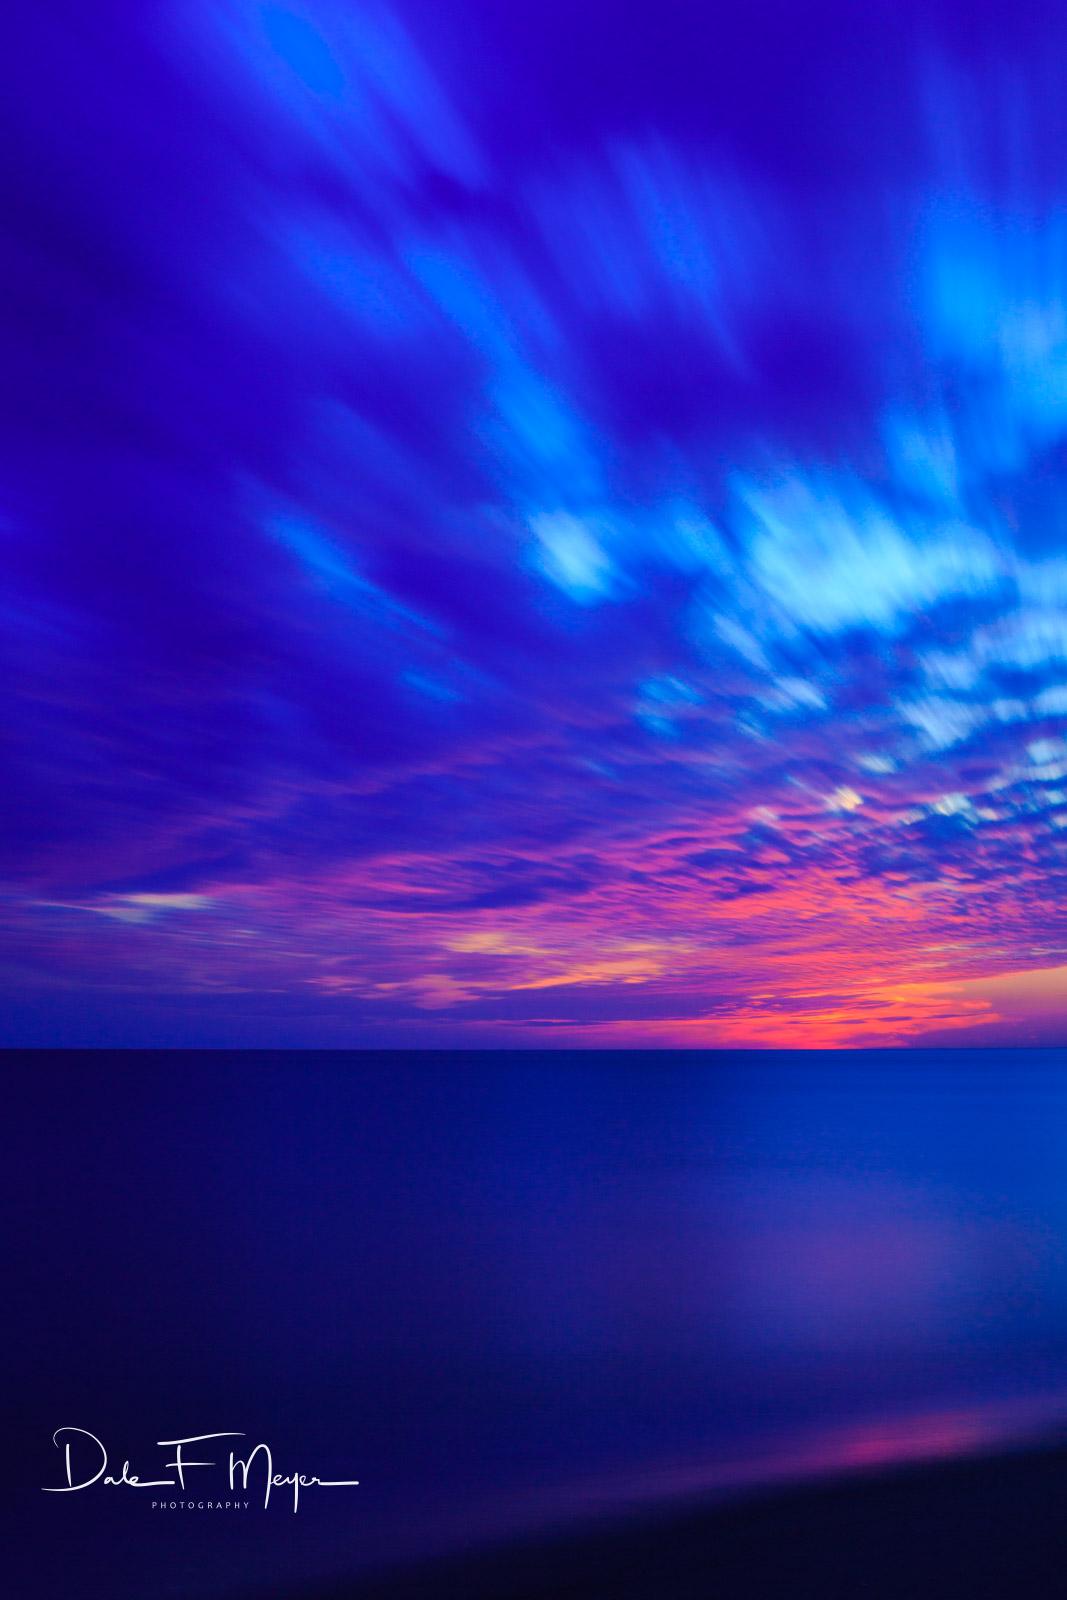 North Carolina,Oak Island,beach,ocean,sunset, photo